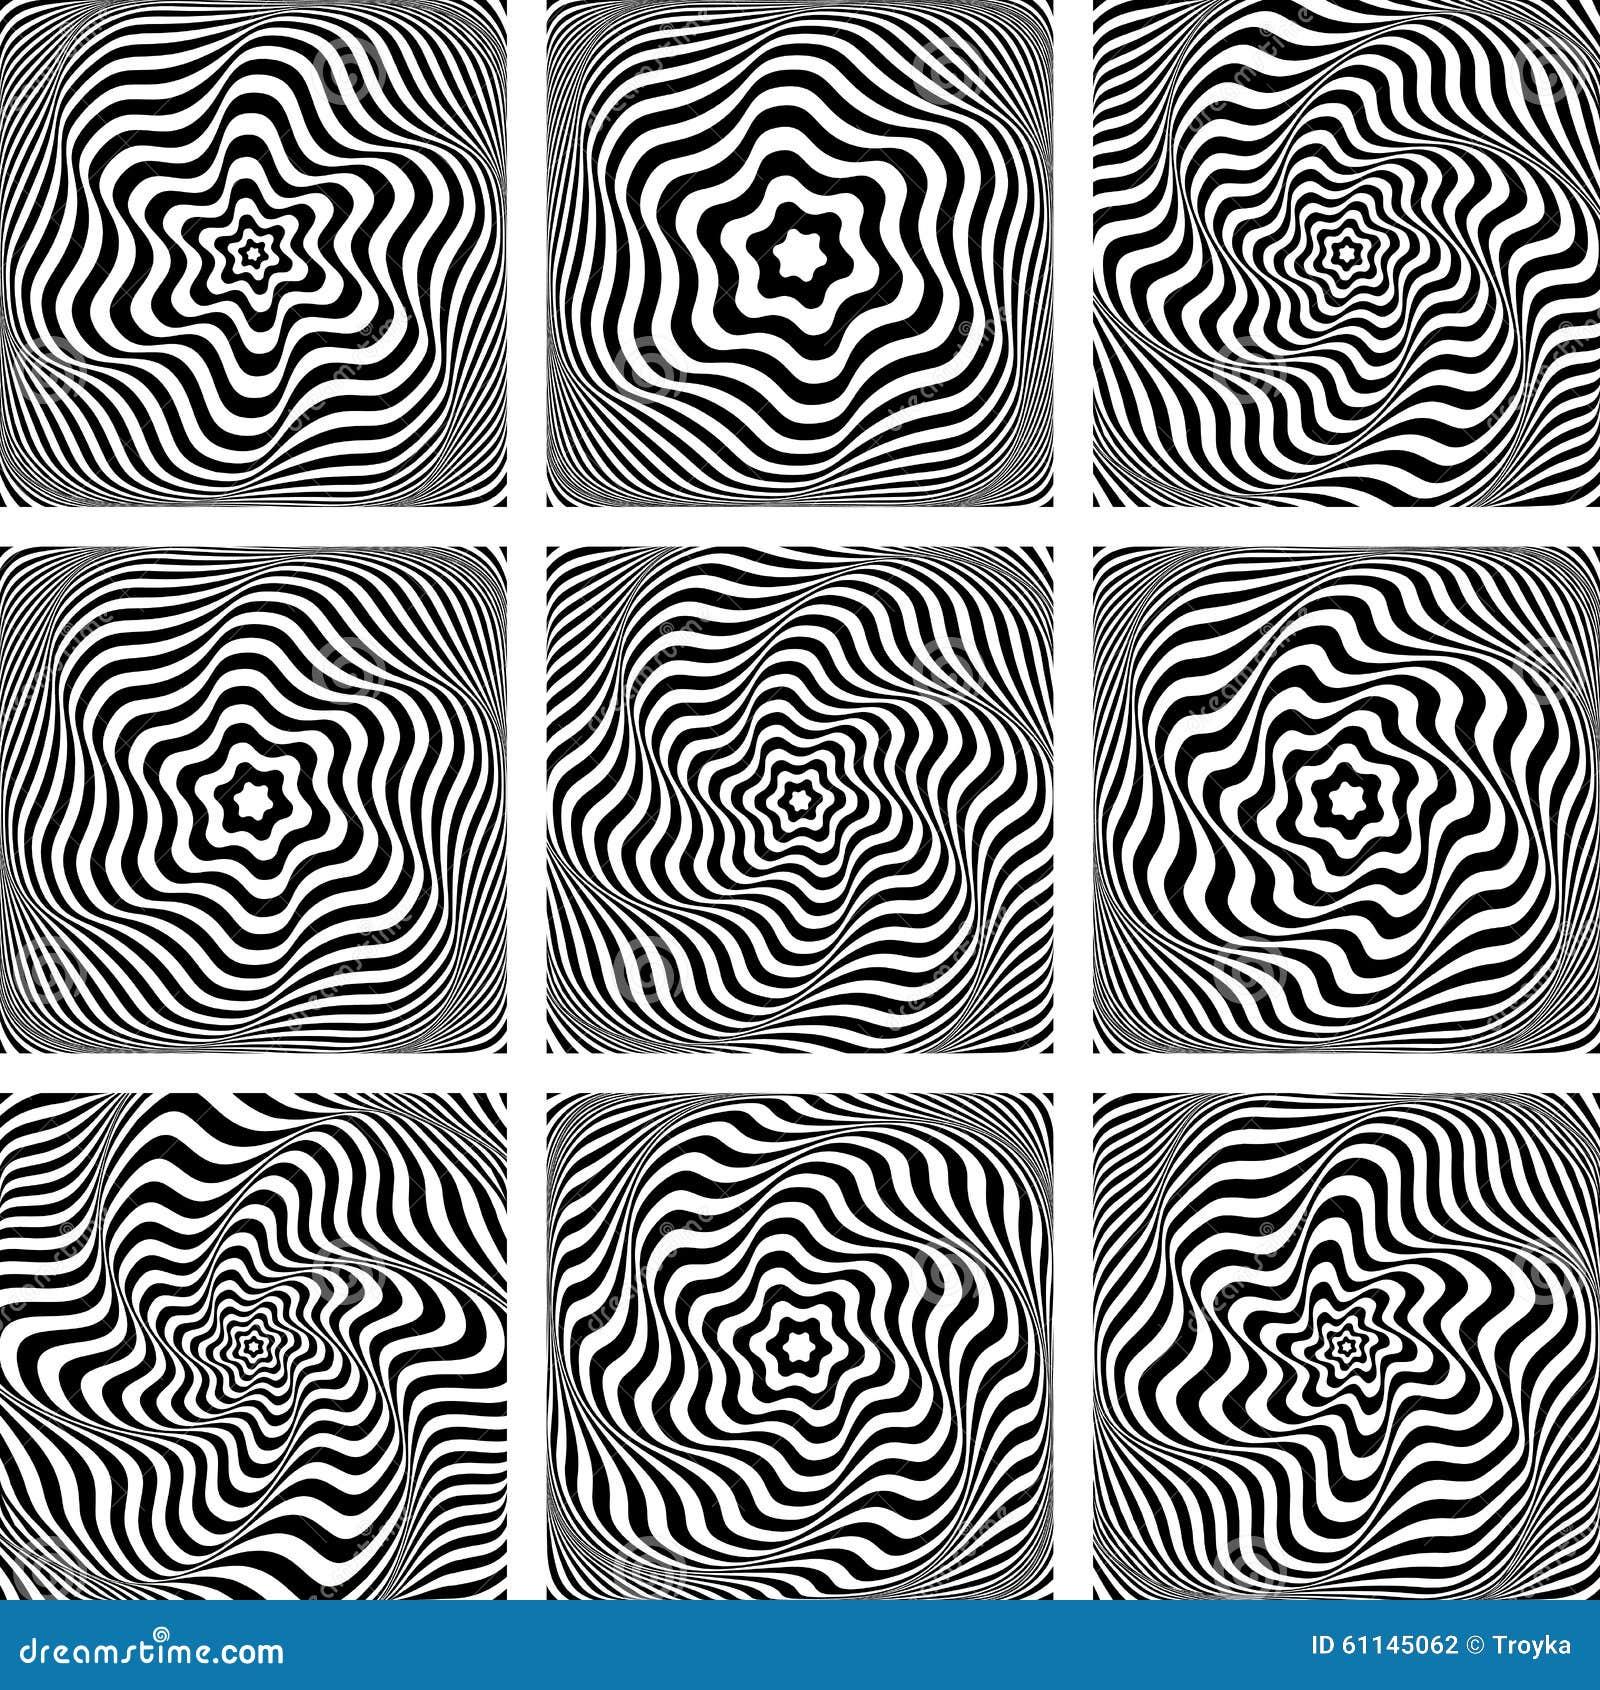 Art And Design Art Movements: Illusion Of Wavy Rotation. Design Elements Set. Stock